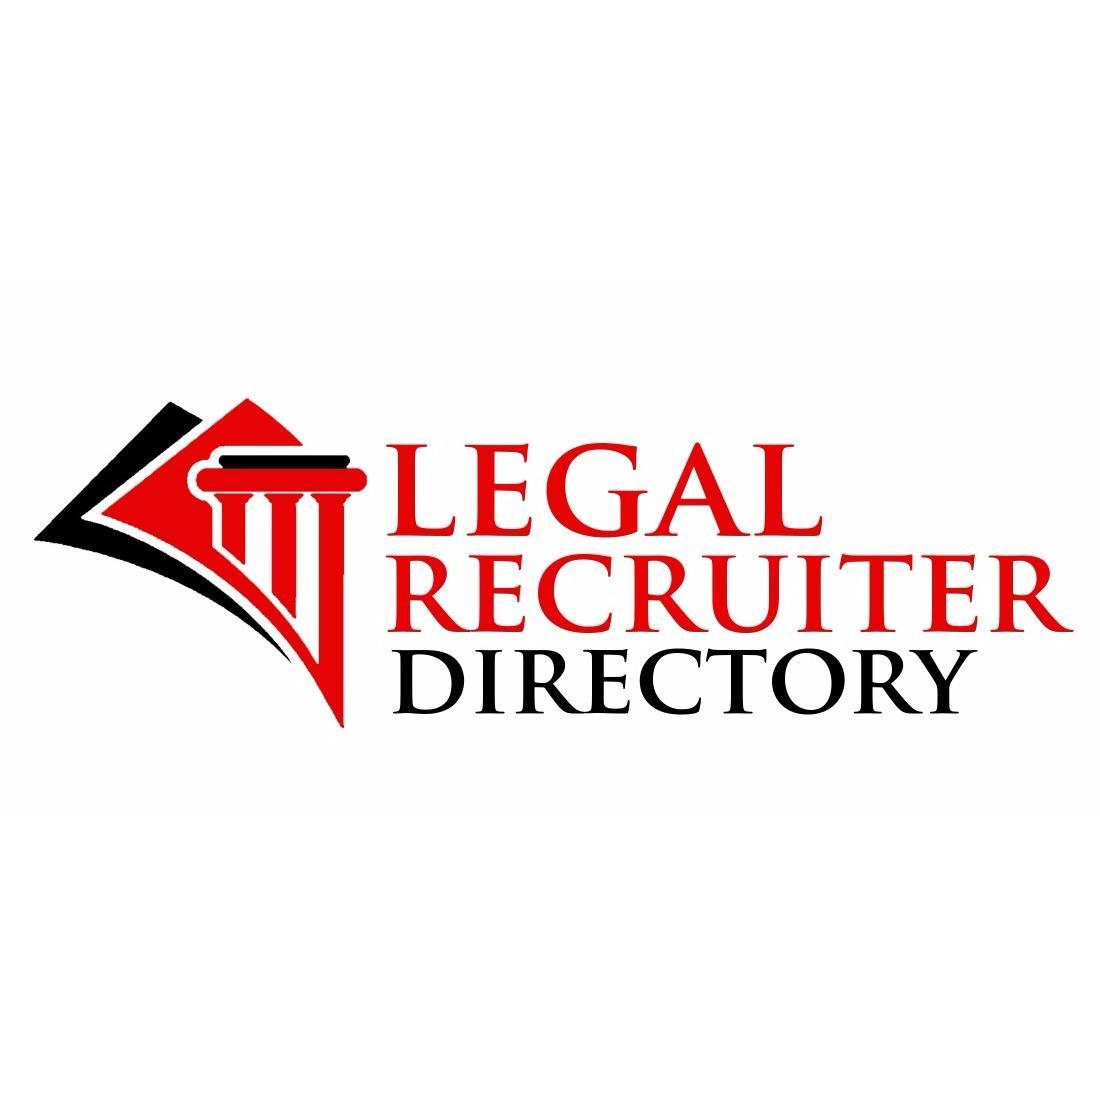 Legal Recruiter Directory